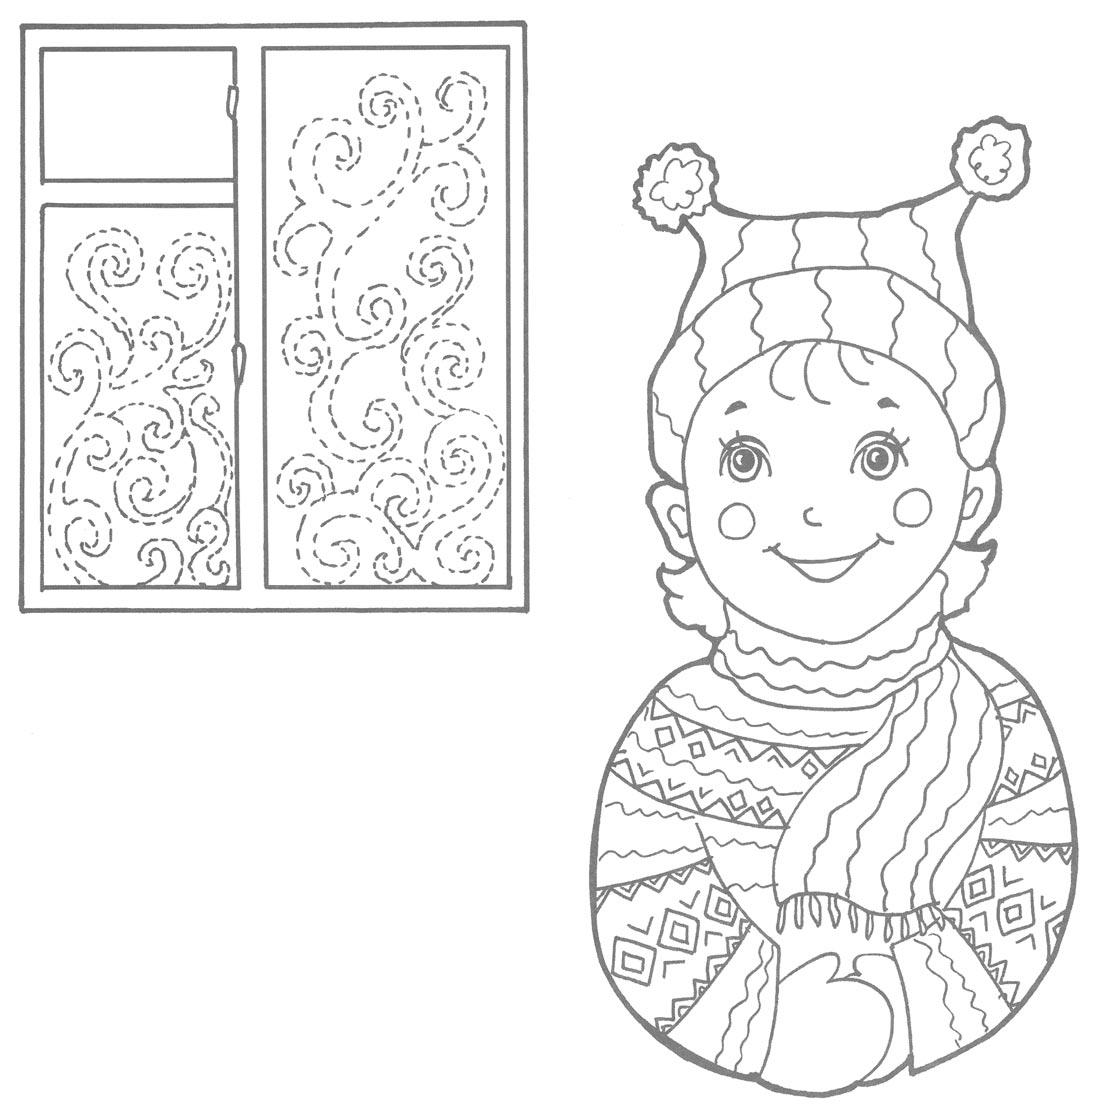 Раскраска зимний узор на окне